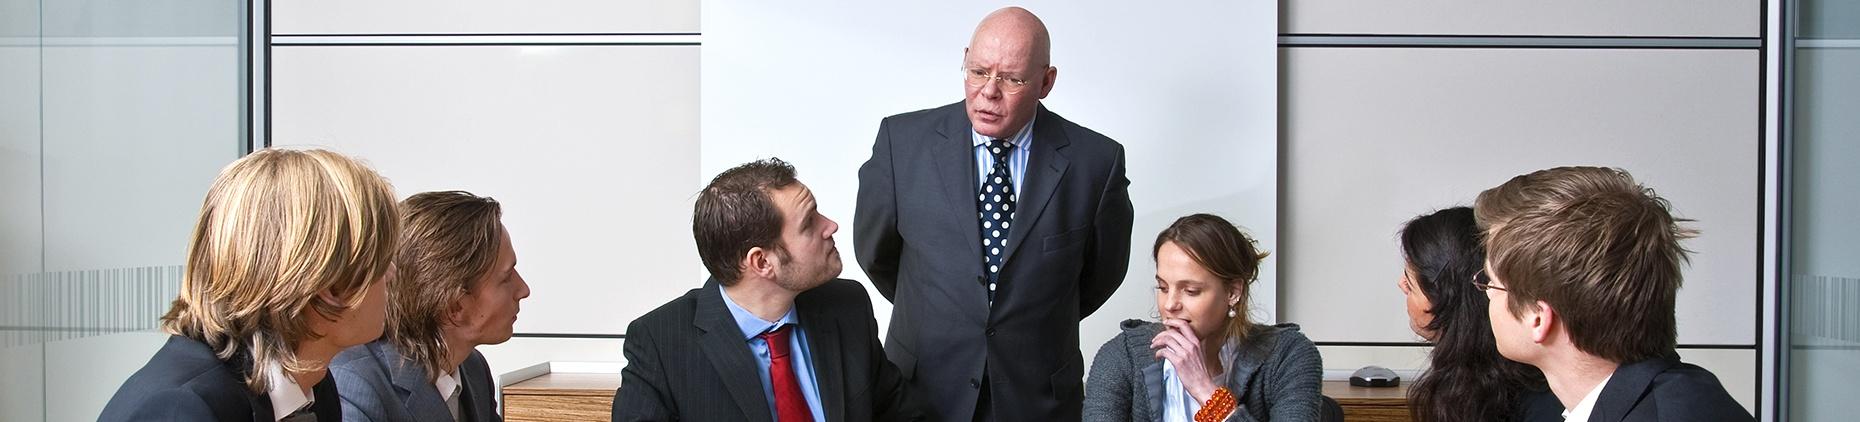 5 To-Dos When Selling to Senior Executives